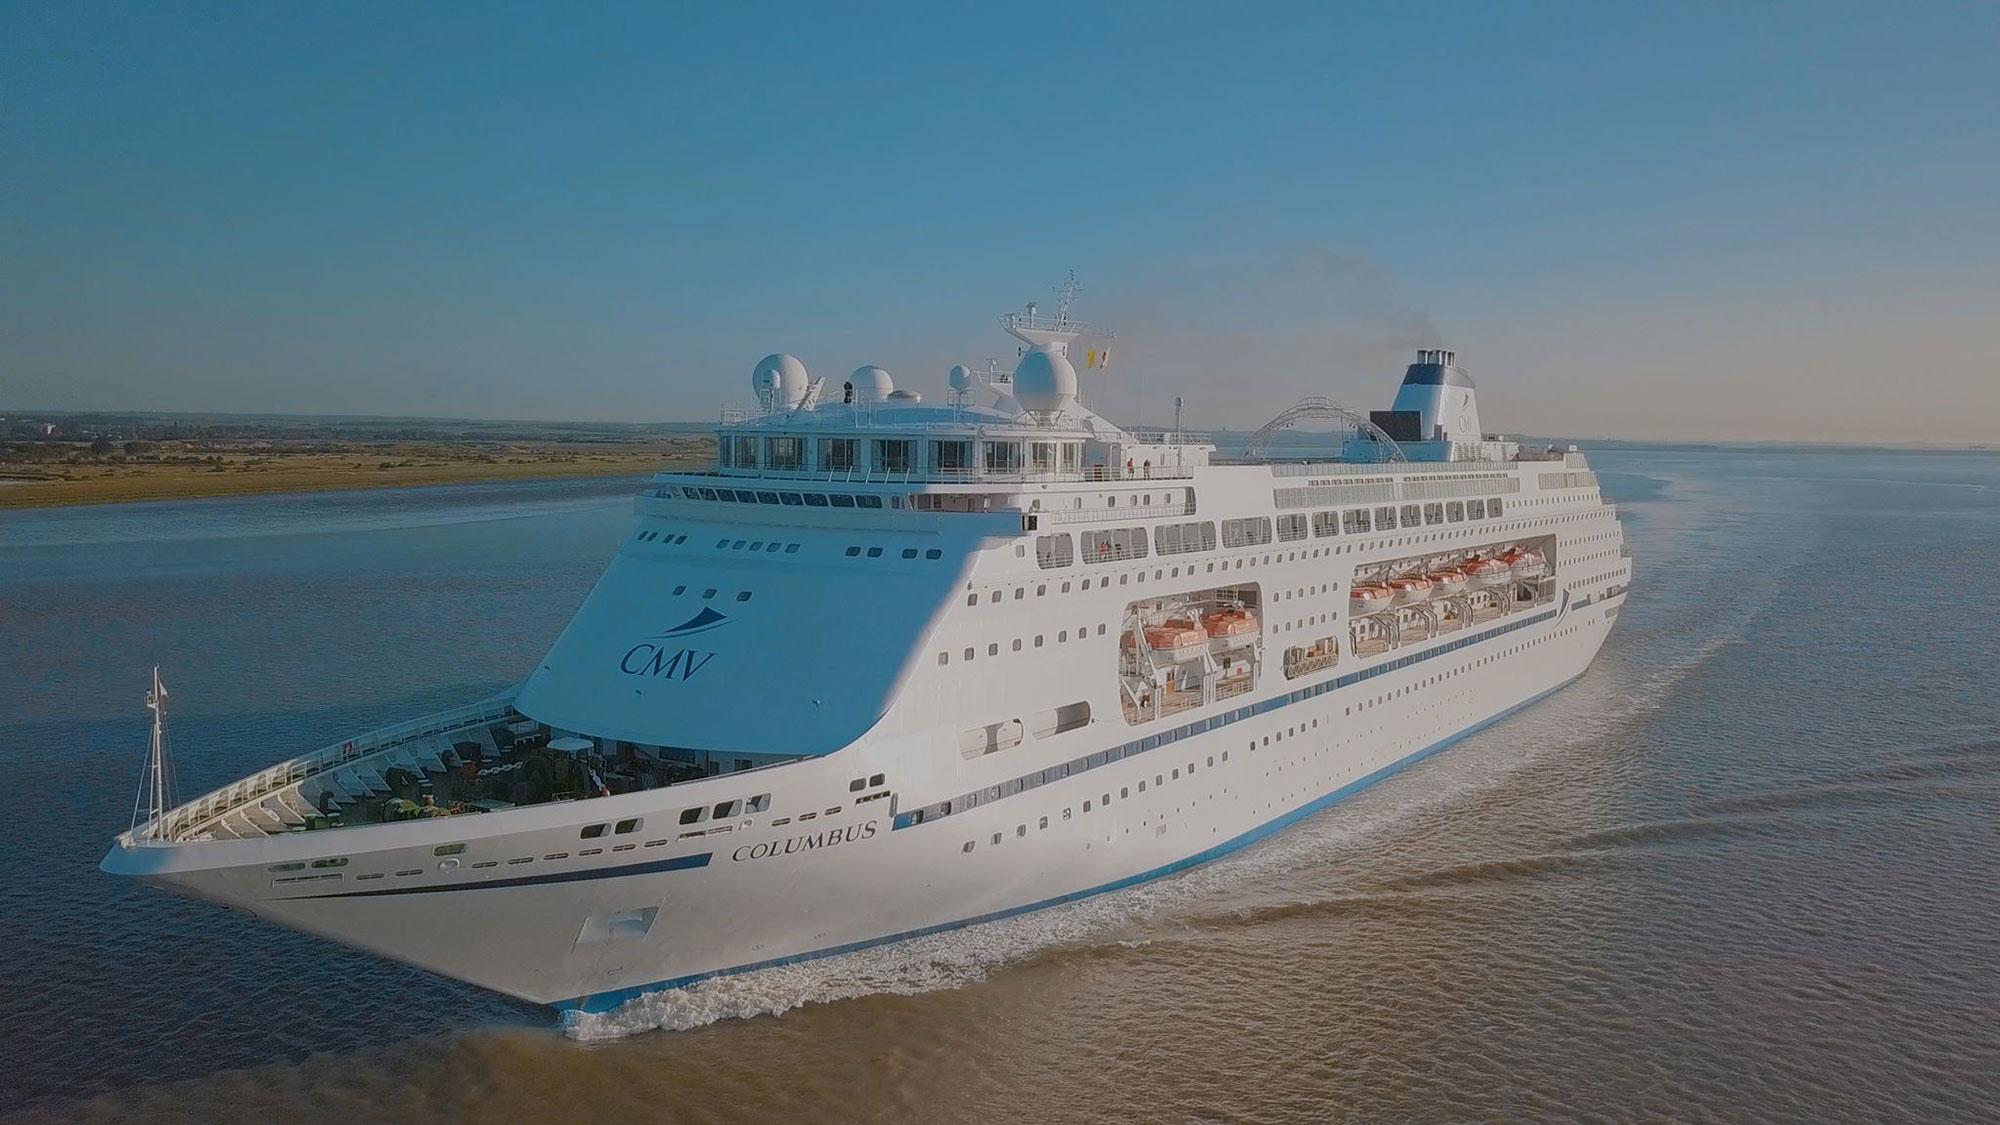 Cruise & Maritime Voyages' world cruise a relative bargain